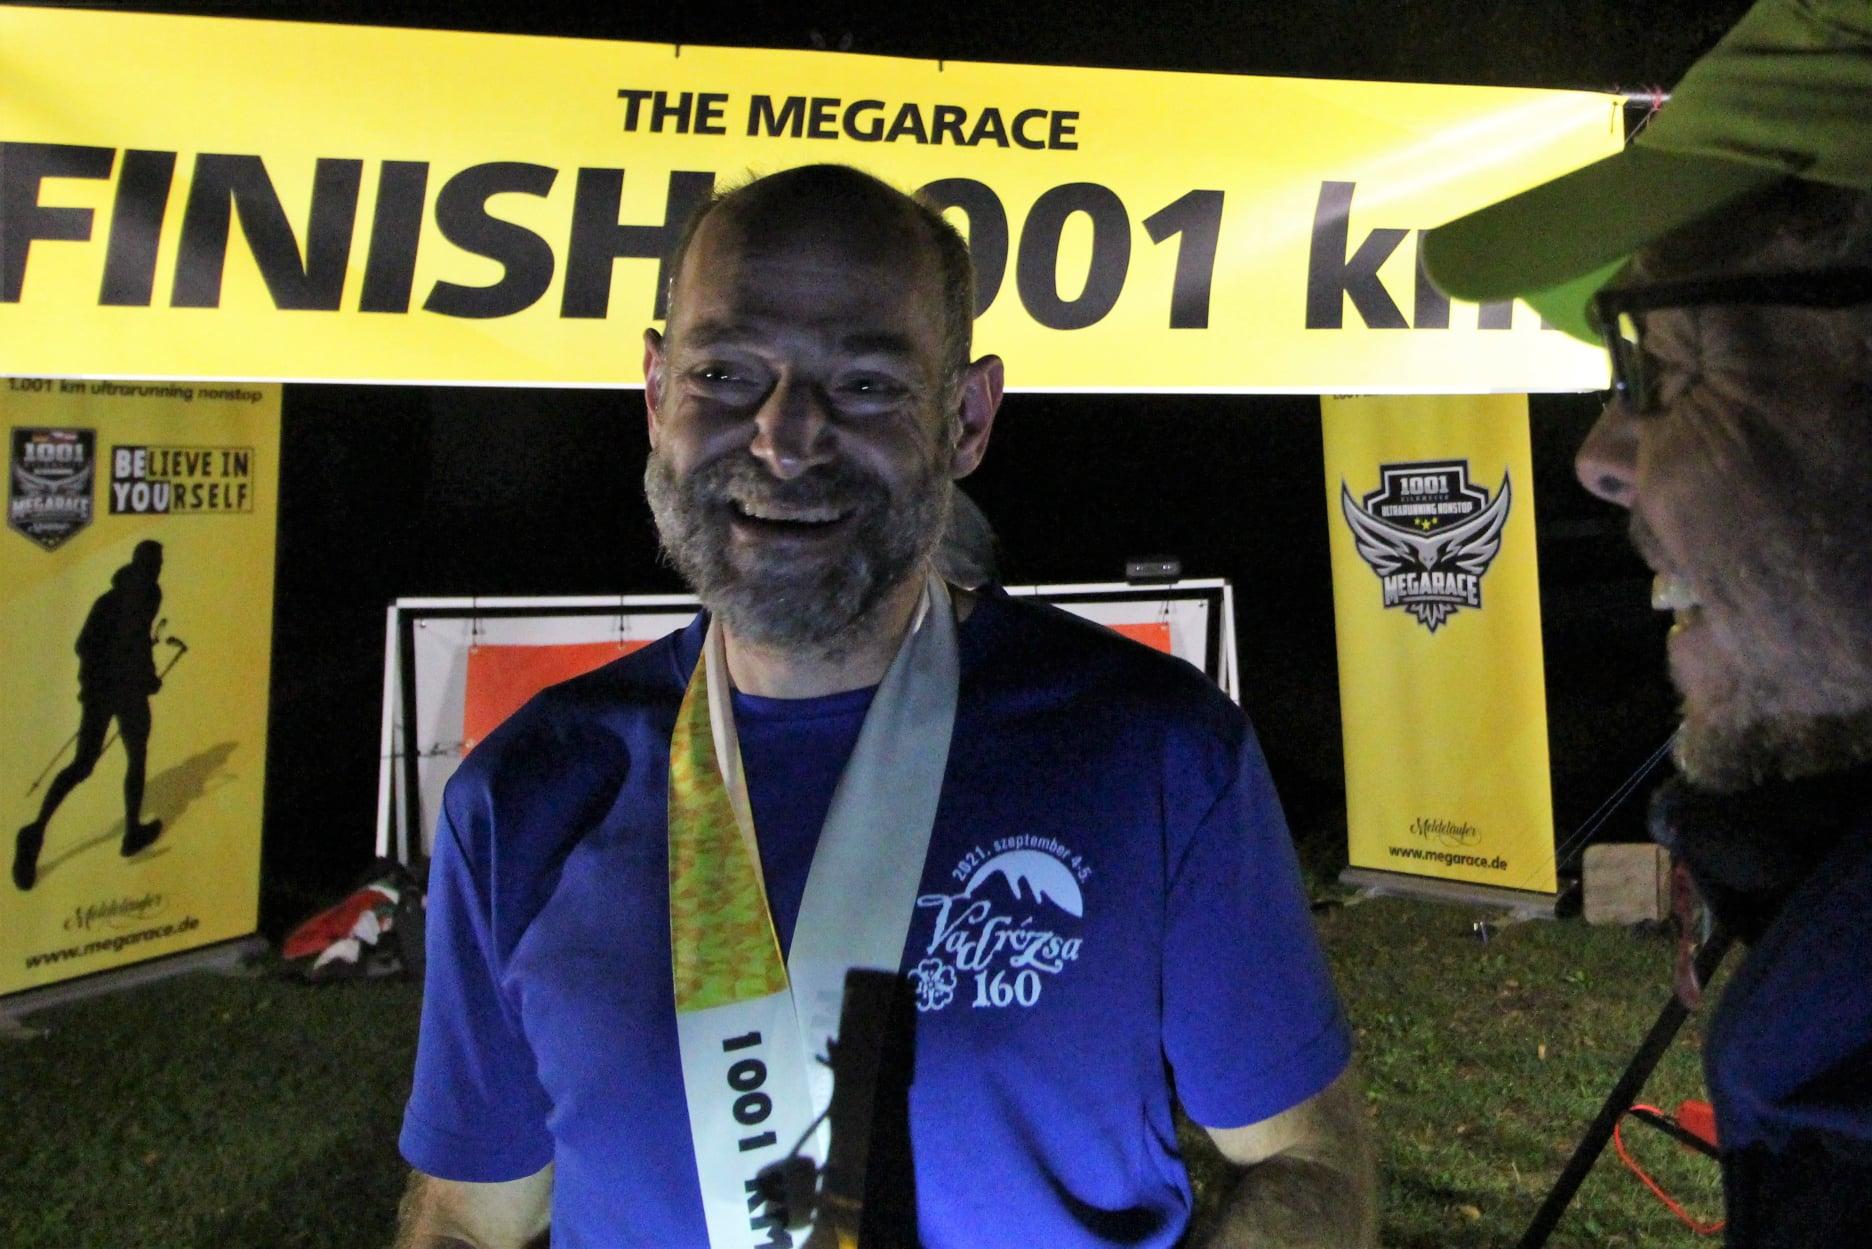 Hungarian Ultrarunner Wins World's Longest Cross-Country Race, 1,001 Kilometers